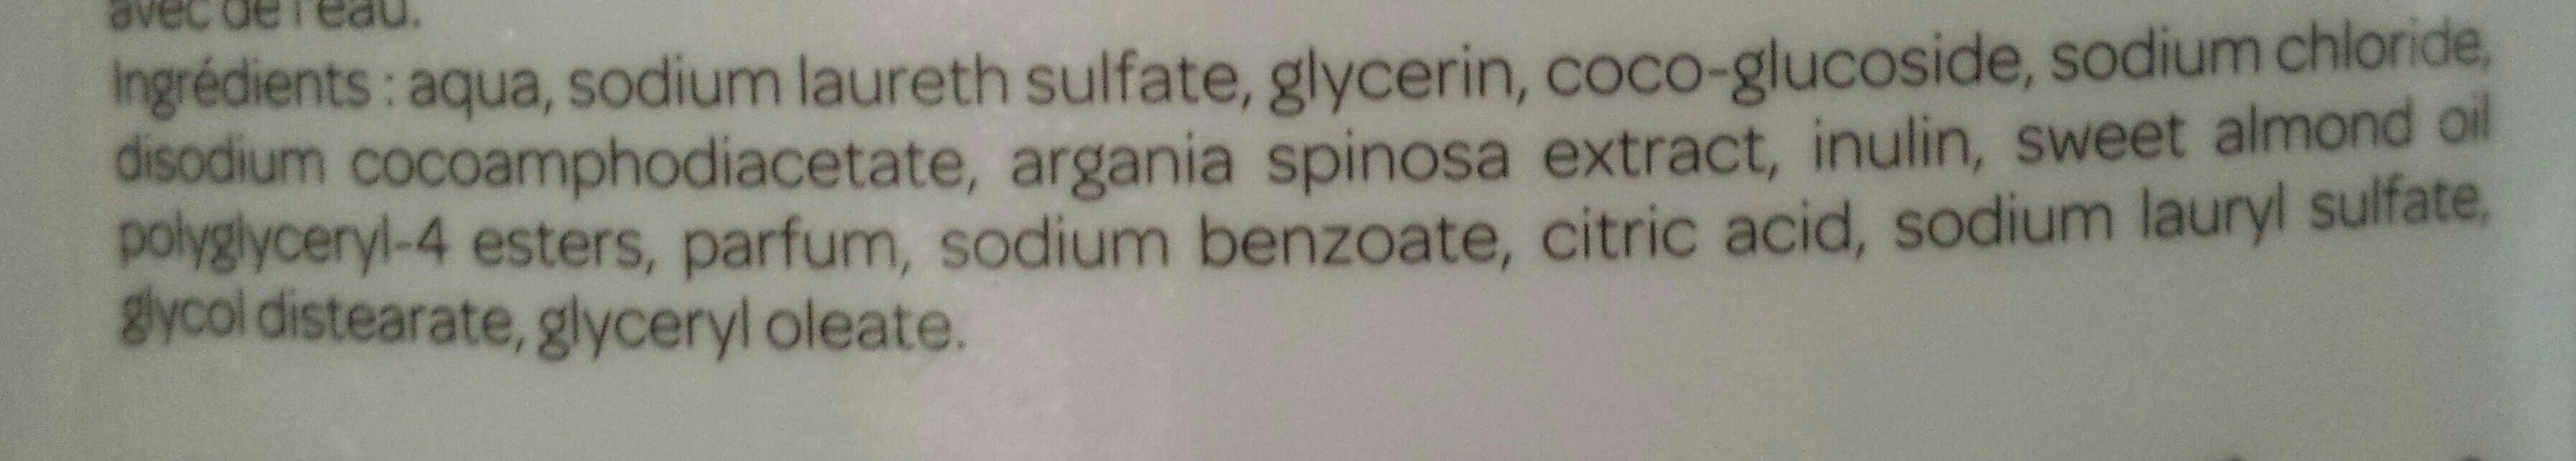 Douche soin hydratation intense - Ingrédients